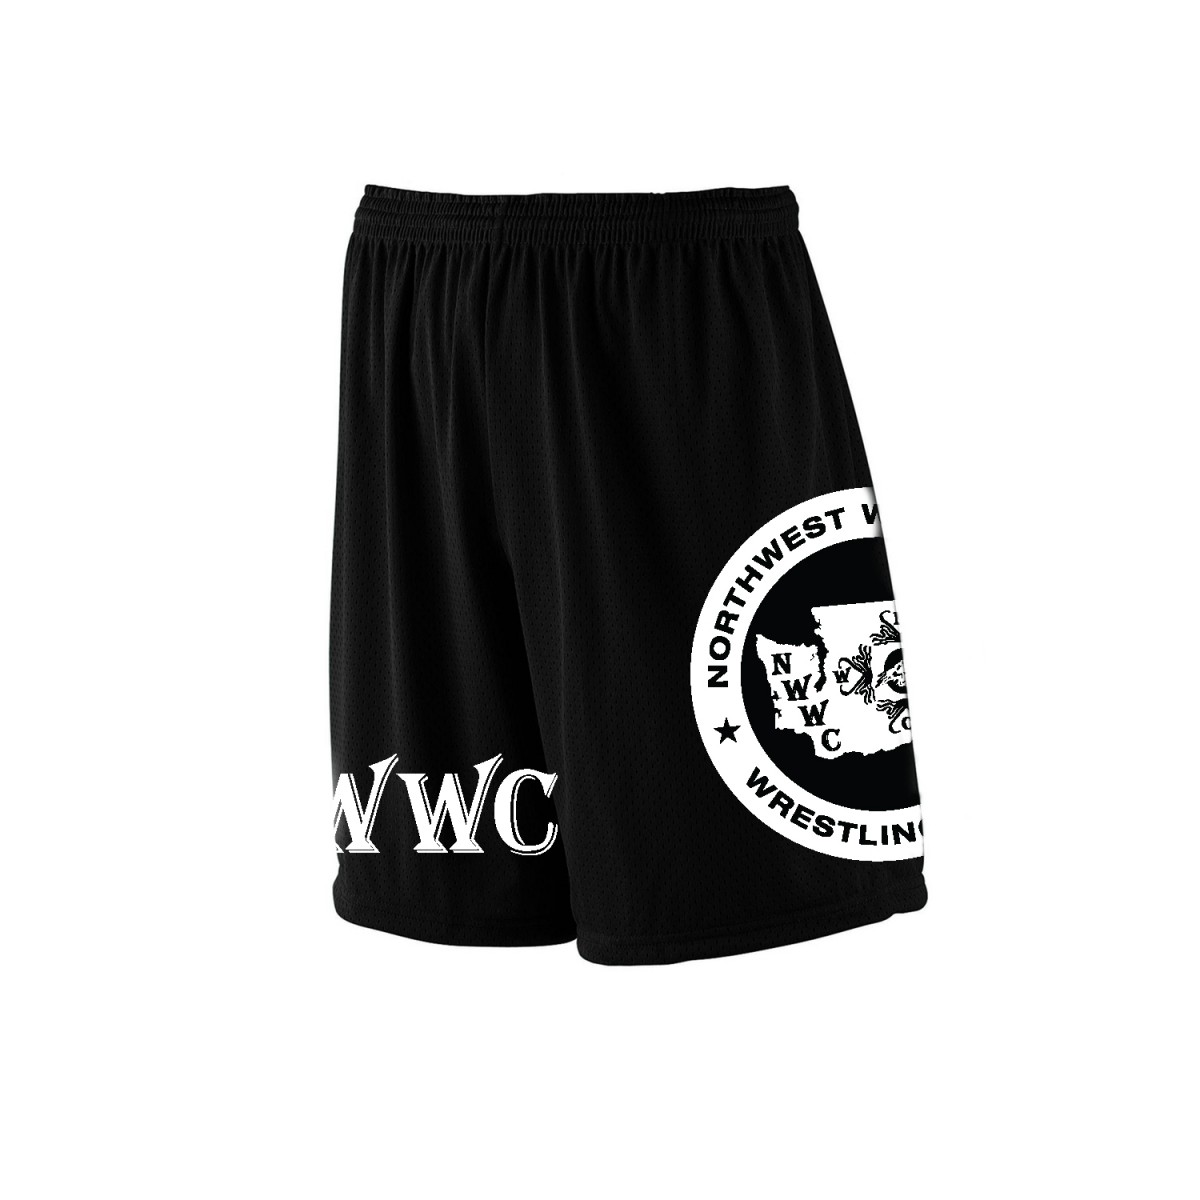 NWWC Black Shorts White Logo-Black-S